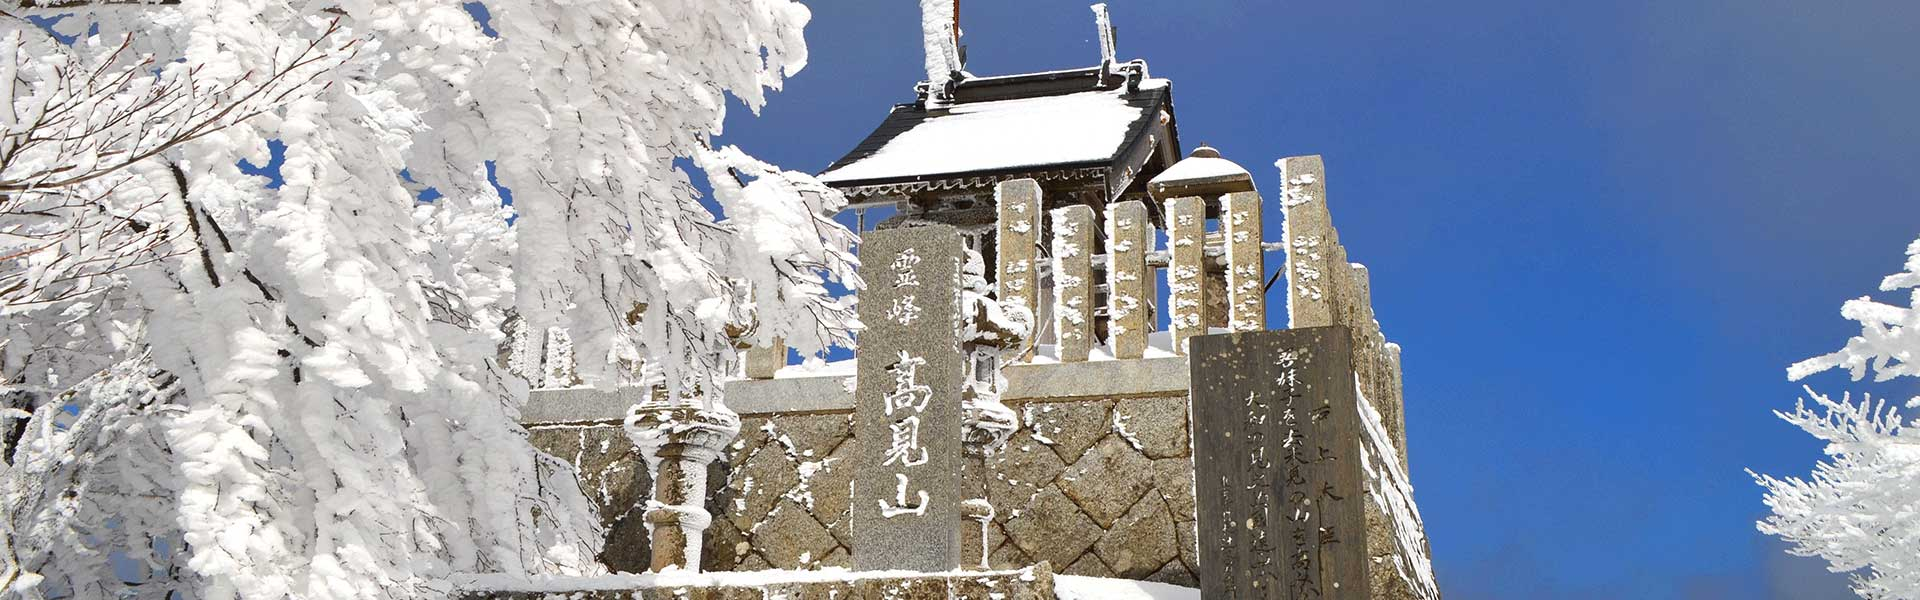 Snow Mountain Trekking